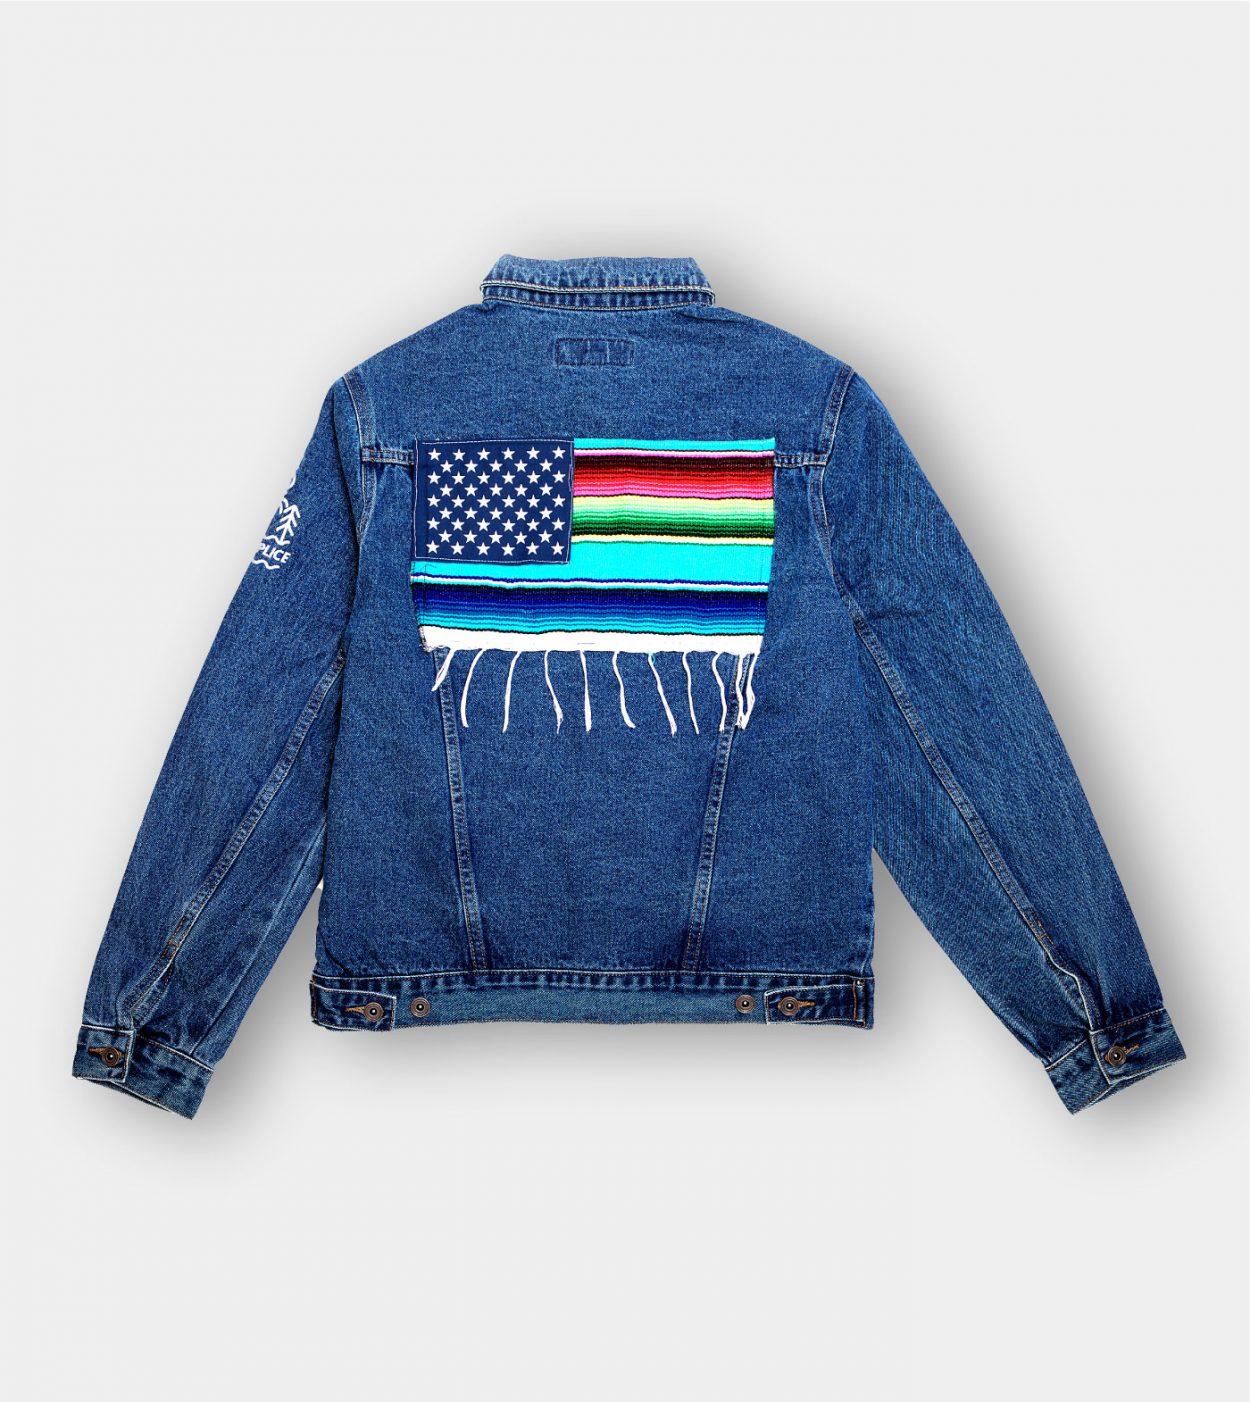 awMi-Bandera-Jean-Jacket